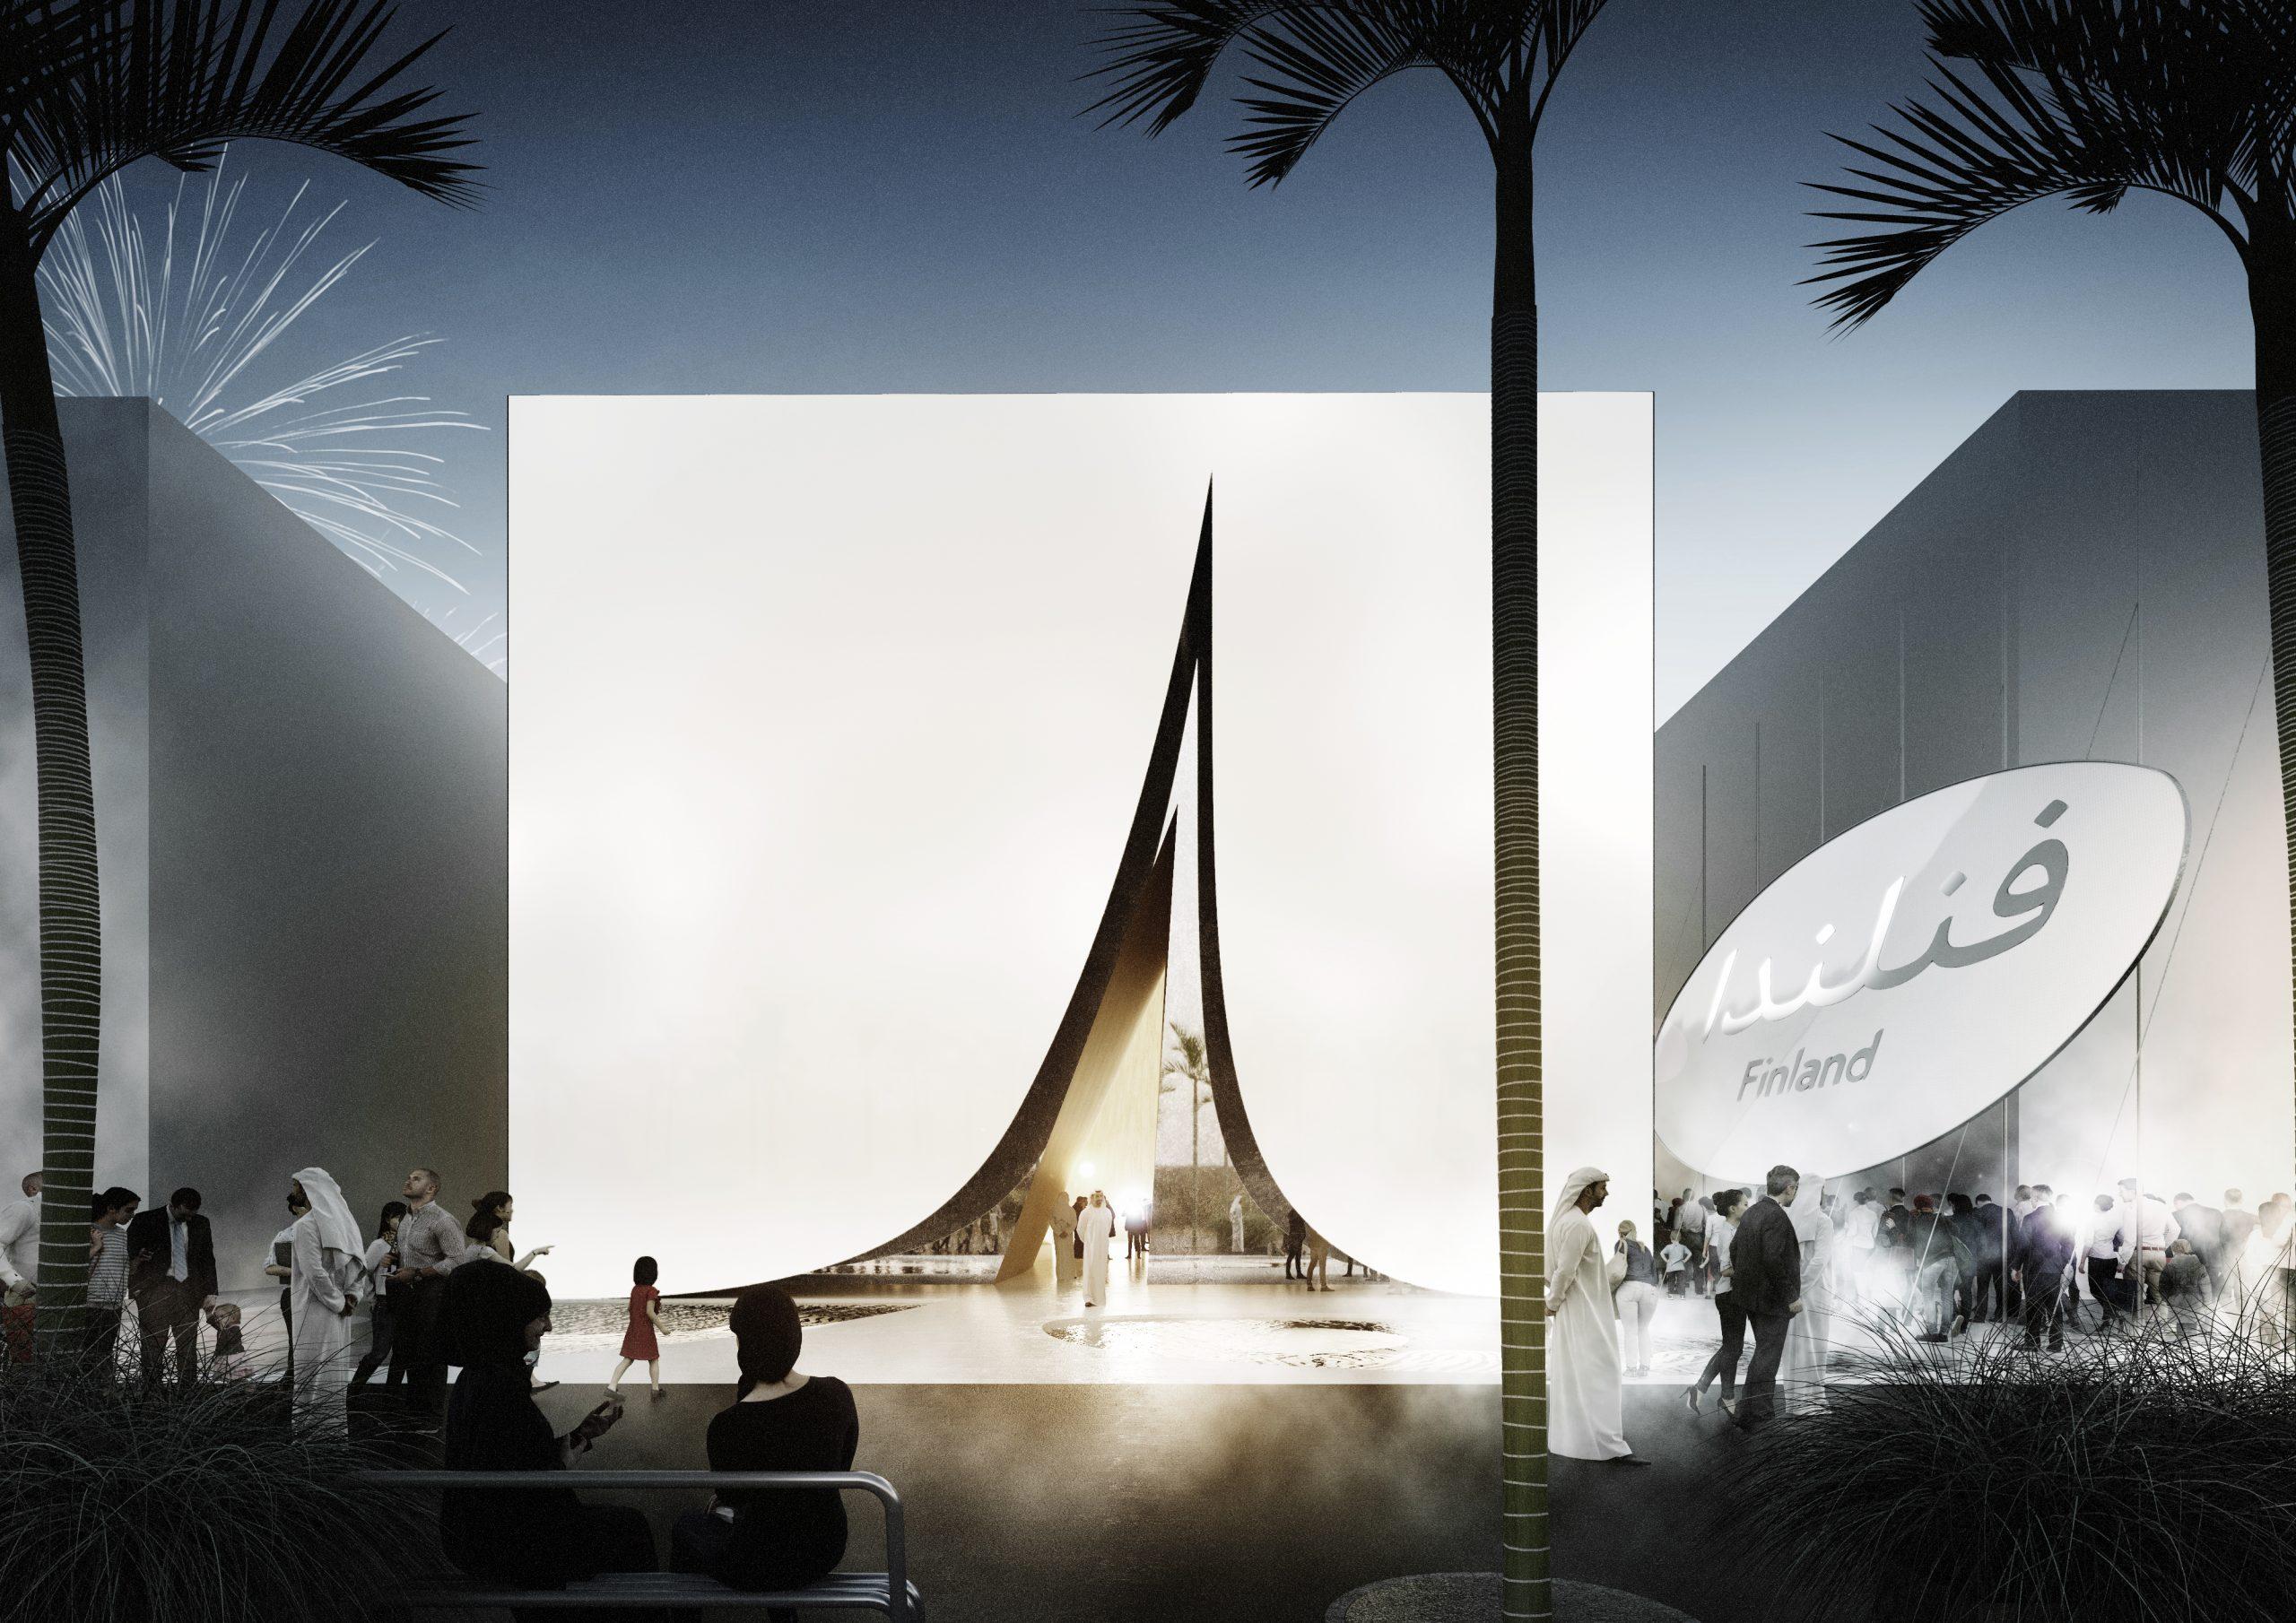 Finlandia 4 - JKMM Architects Finland Pavilion Dubai Expo 2020 Main entrance